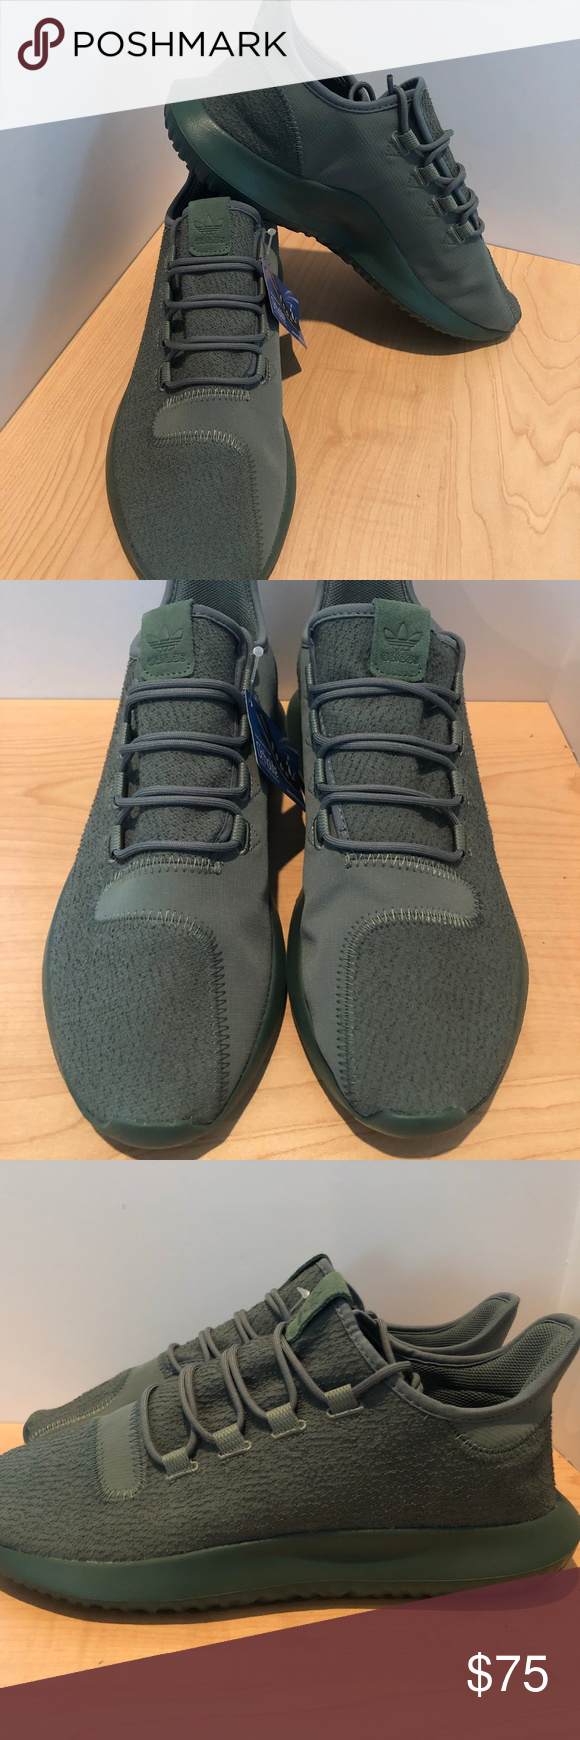 info for 1c6f0 25645 Adidas Originals Tubular Shadow Shoes Trace Green Adidas ...